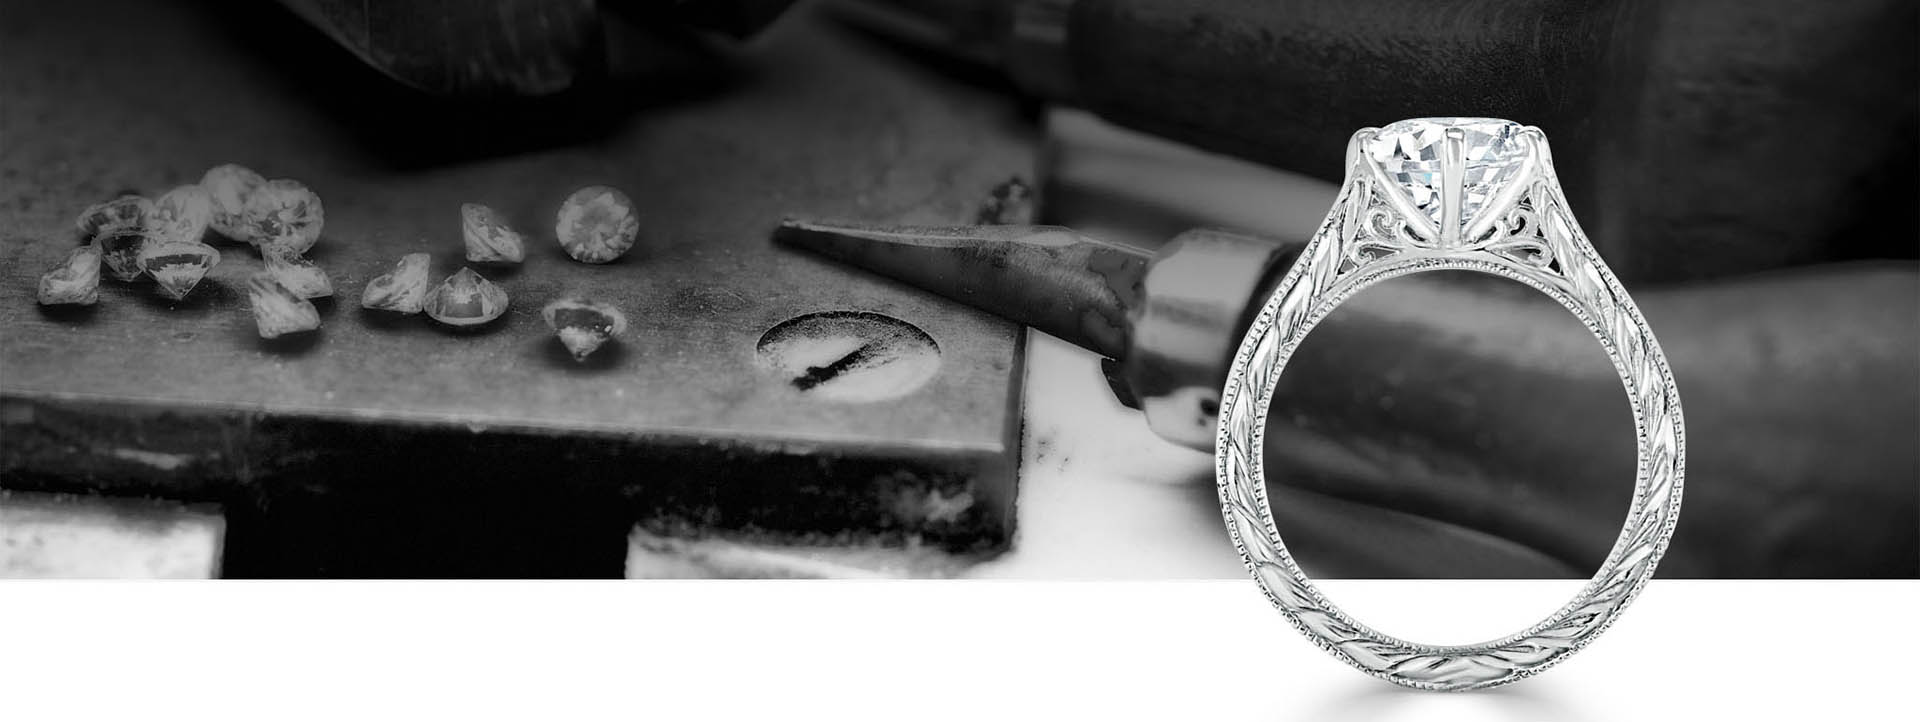 Made to Order Bespoke Jewellery